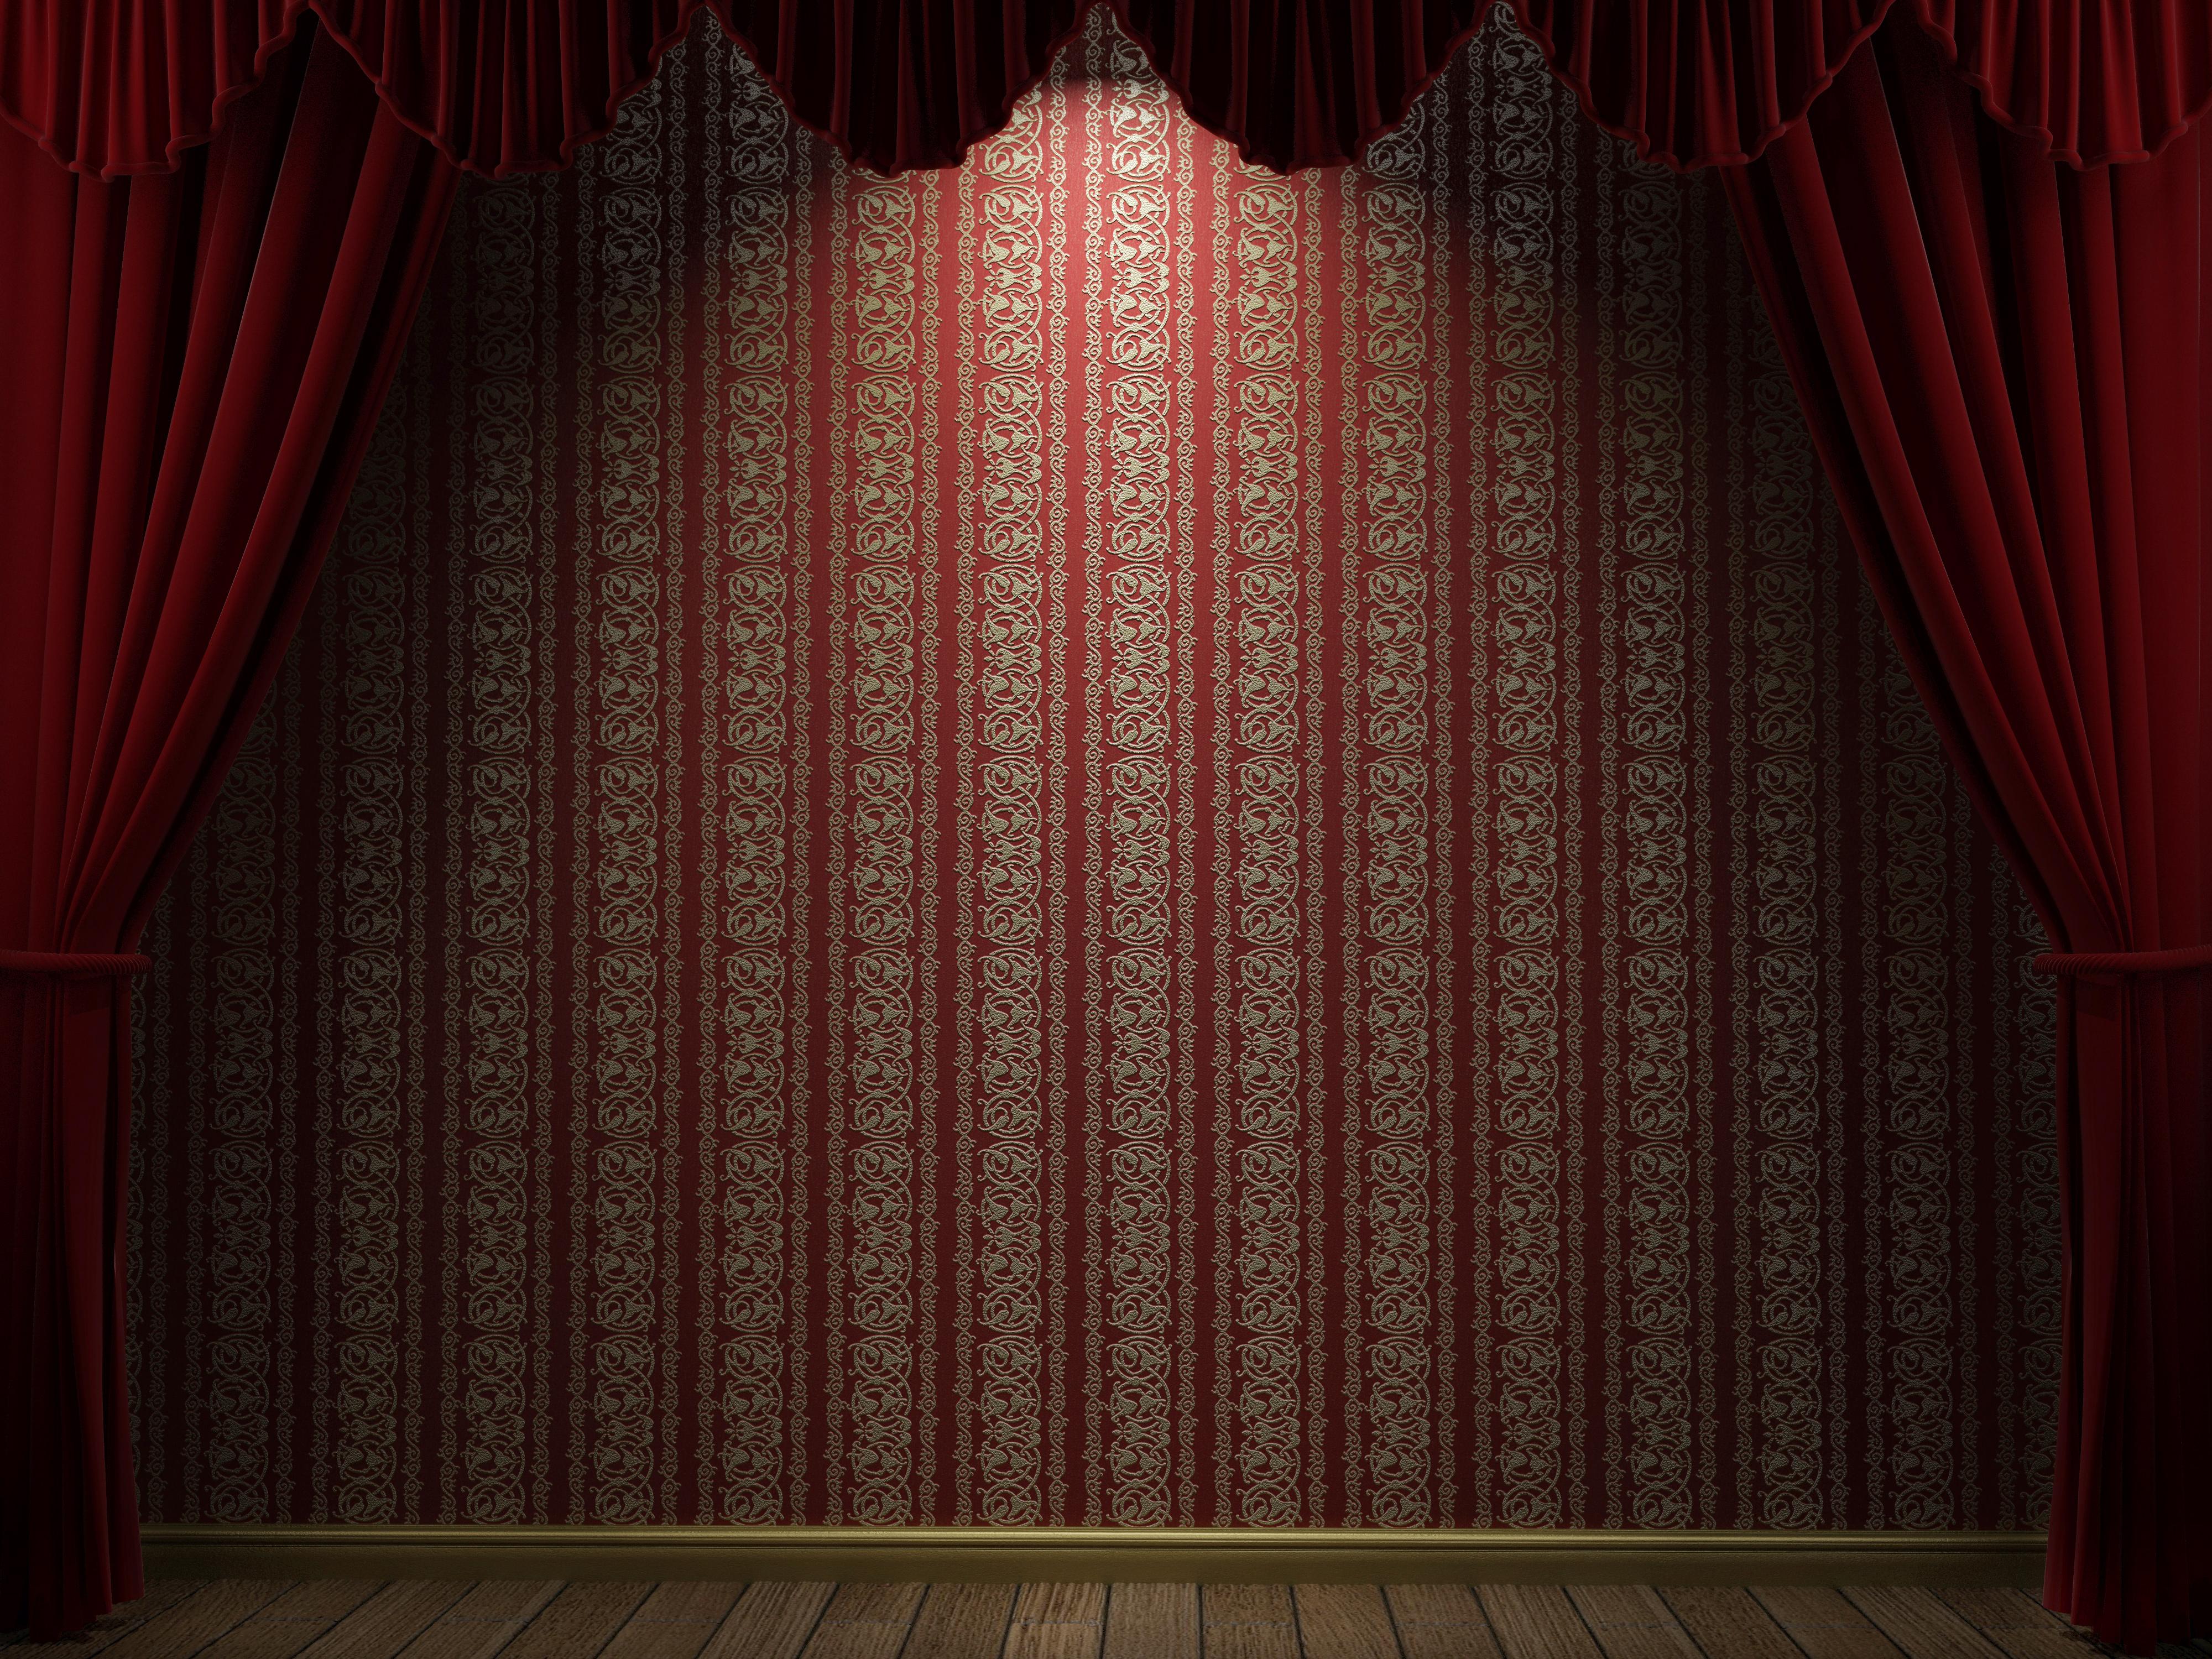 Stage curtain wallpaper wallpapersafari - Stage Curtain Background Gallery 183 Backgrounds Stage